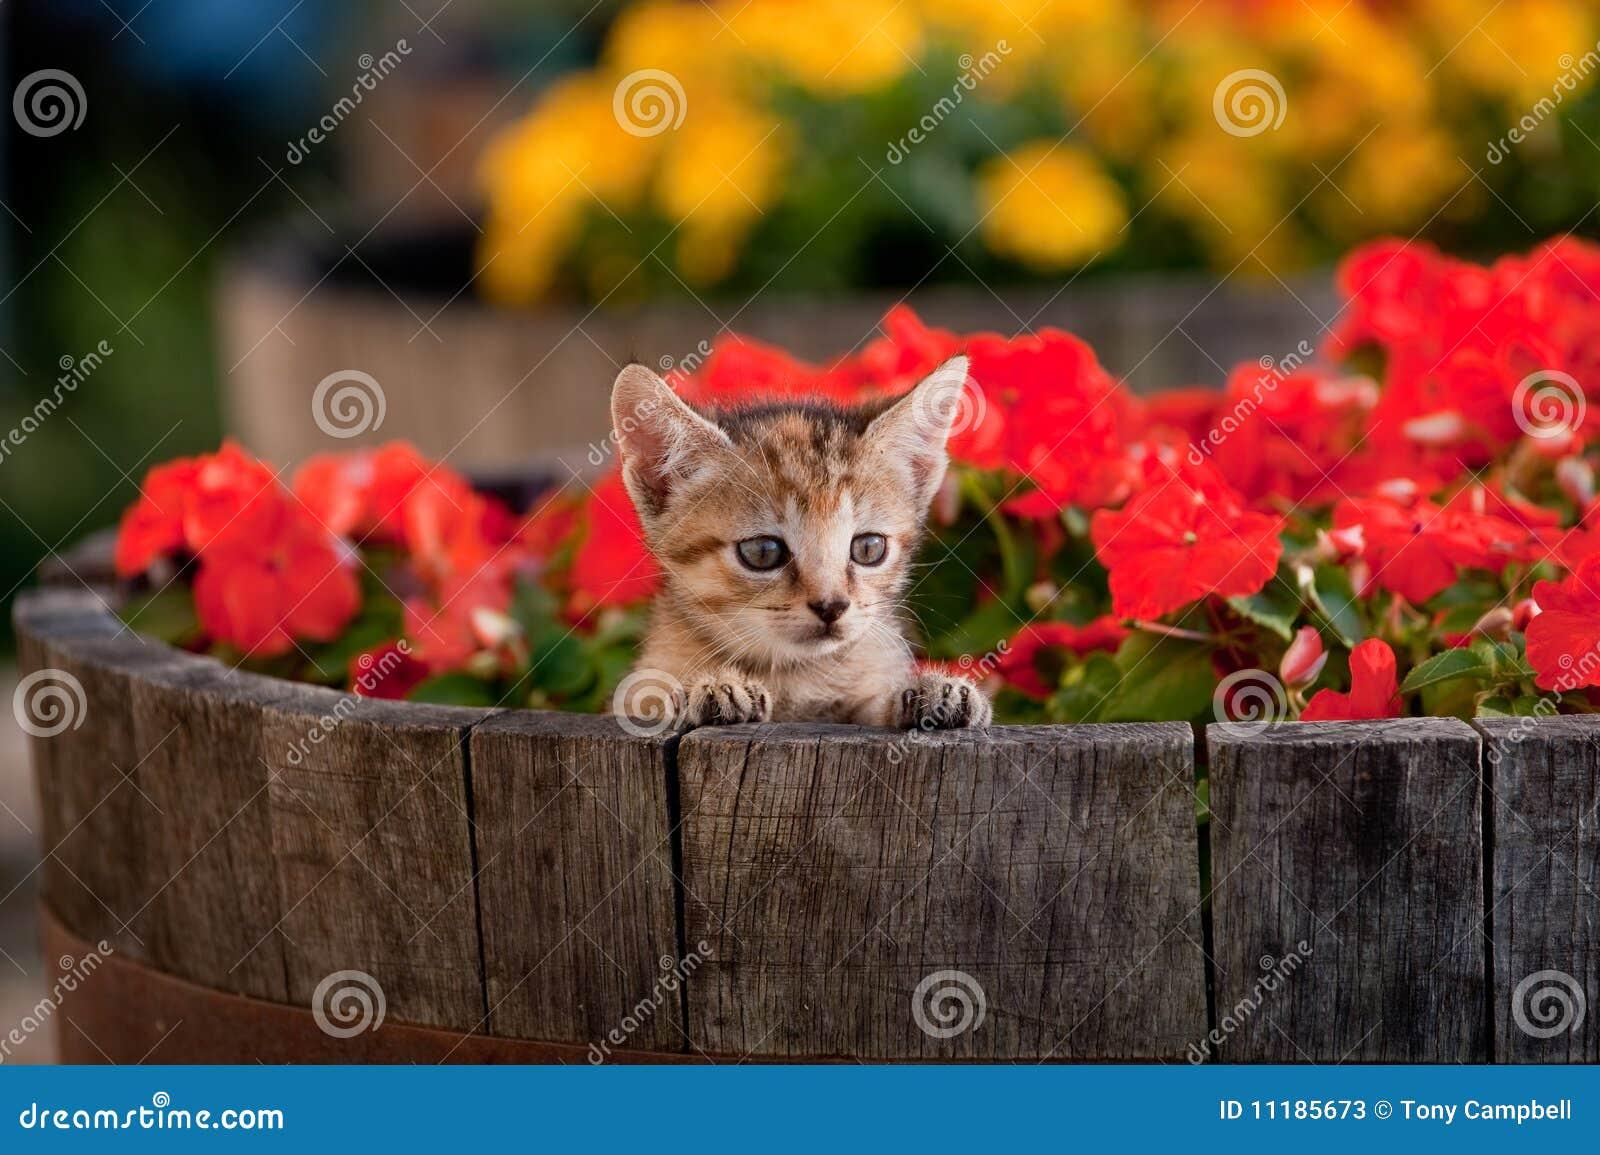 Cute Kitten In Flowers Stock Photos Image 11185673